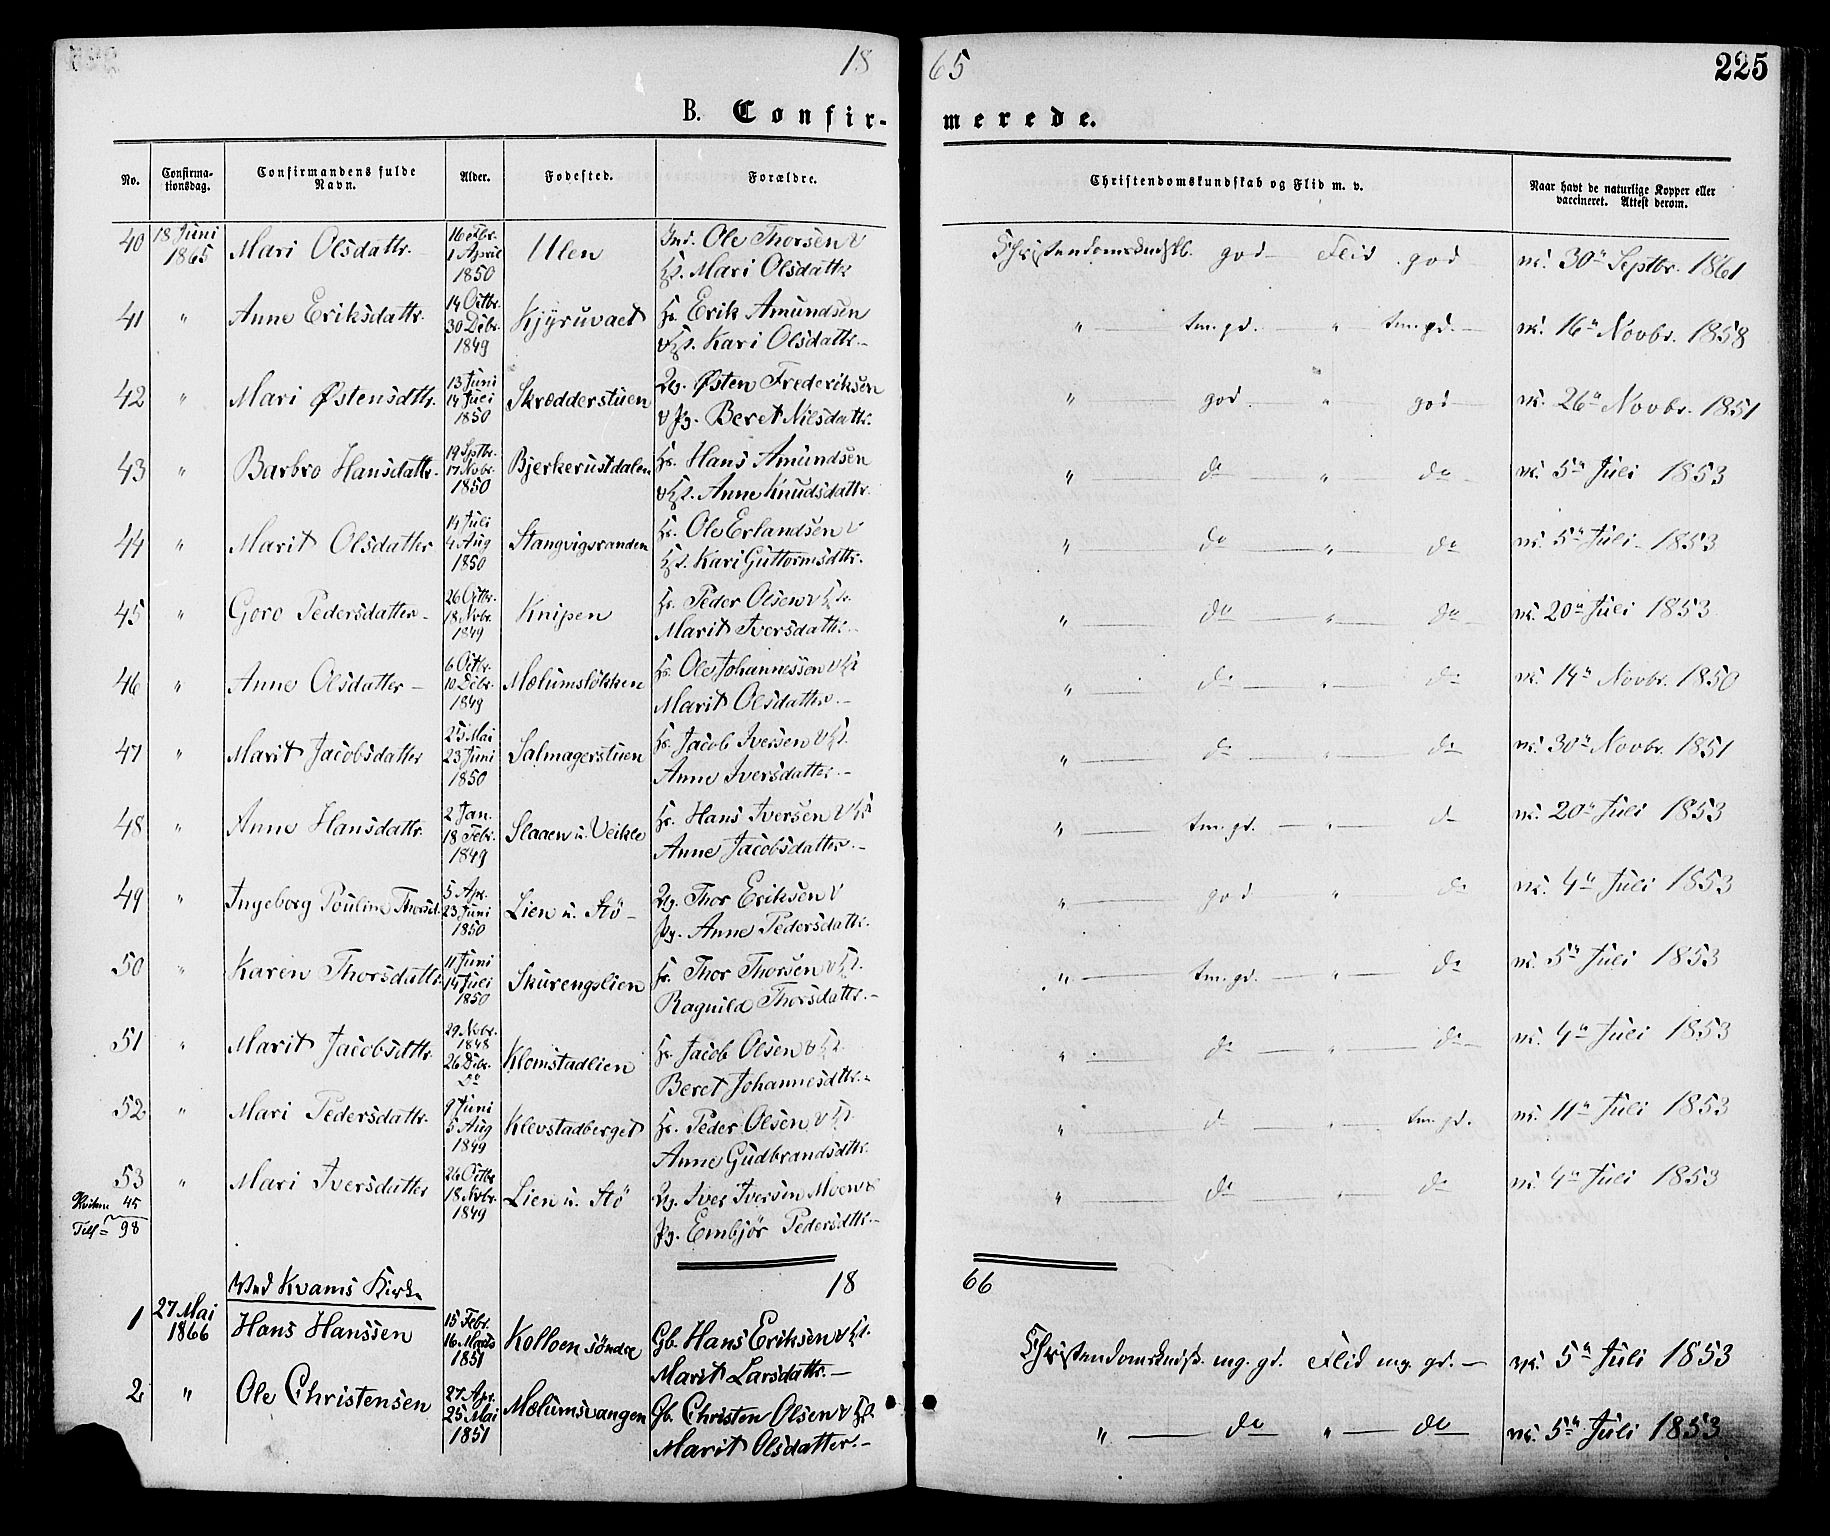 SAH, Nord-Fron prestekontor, Ministerialbok nr. 2, 1865-1883, s. 225